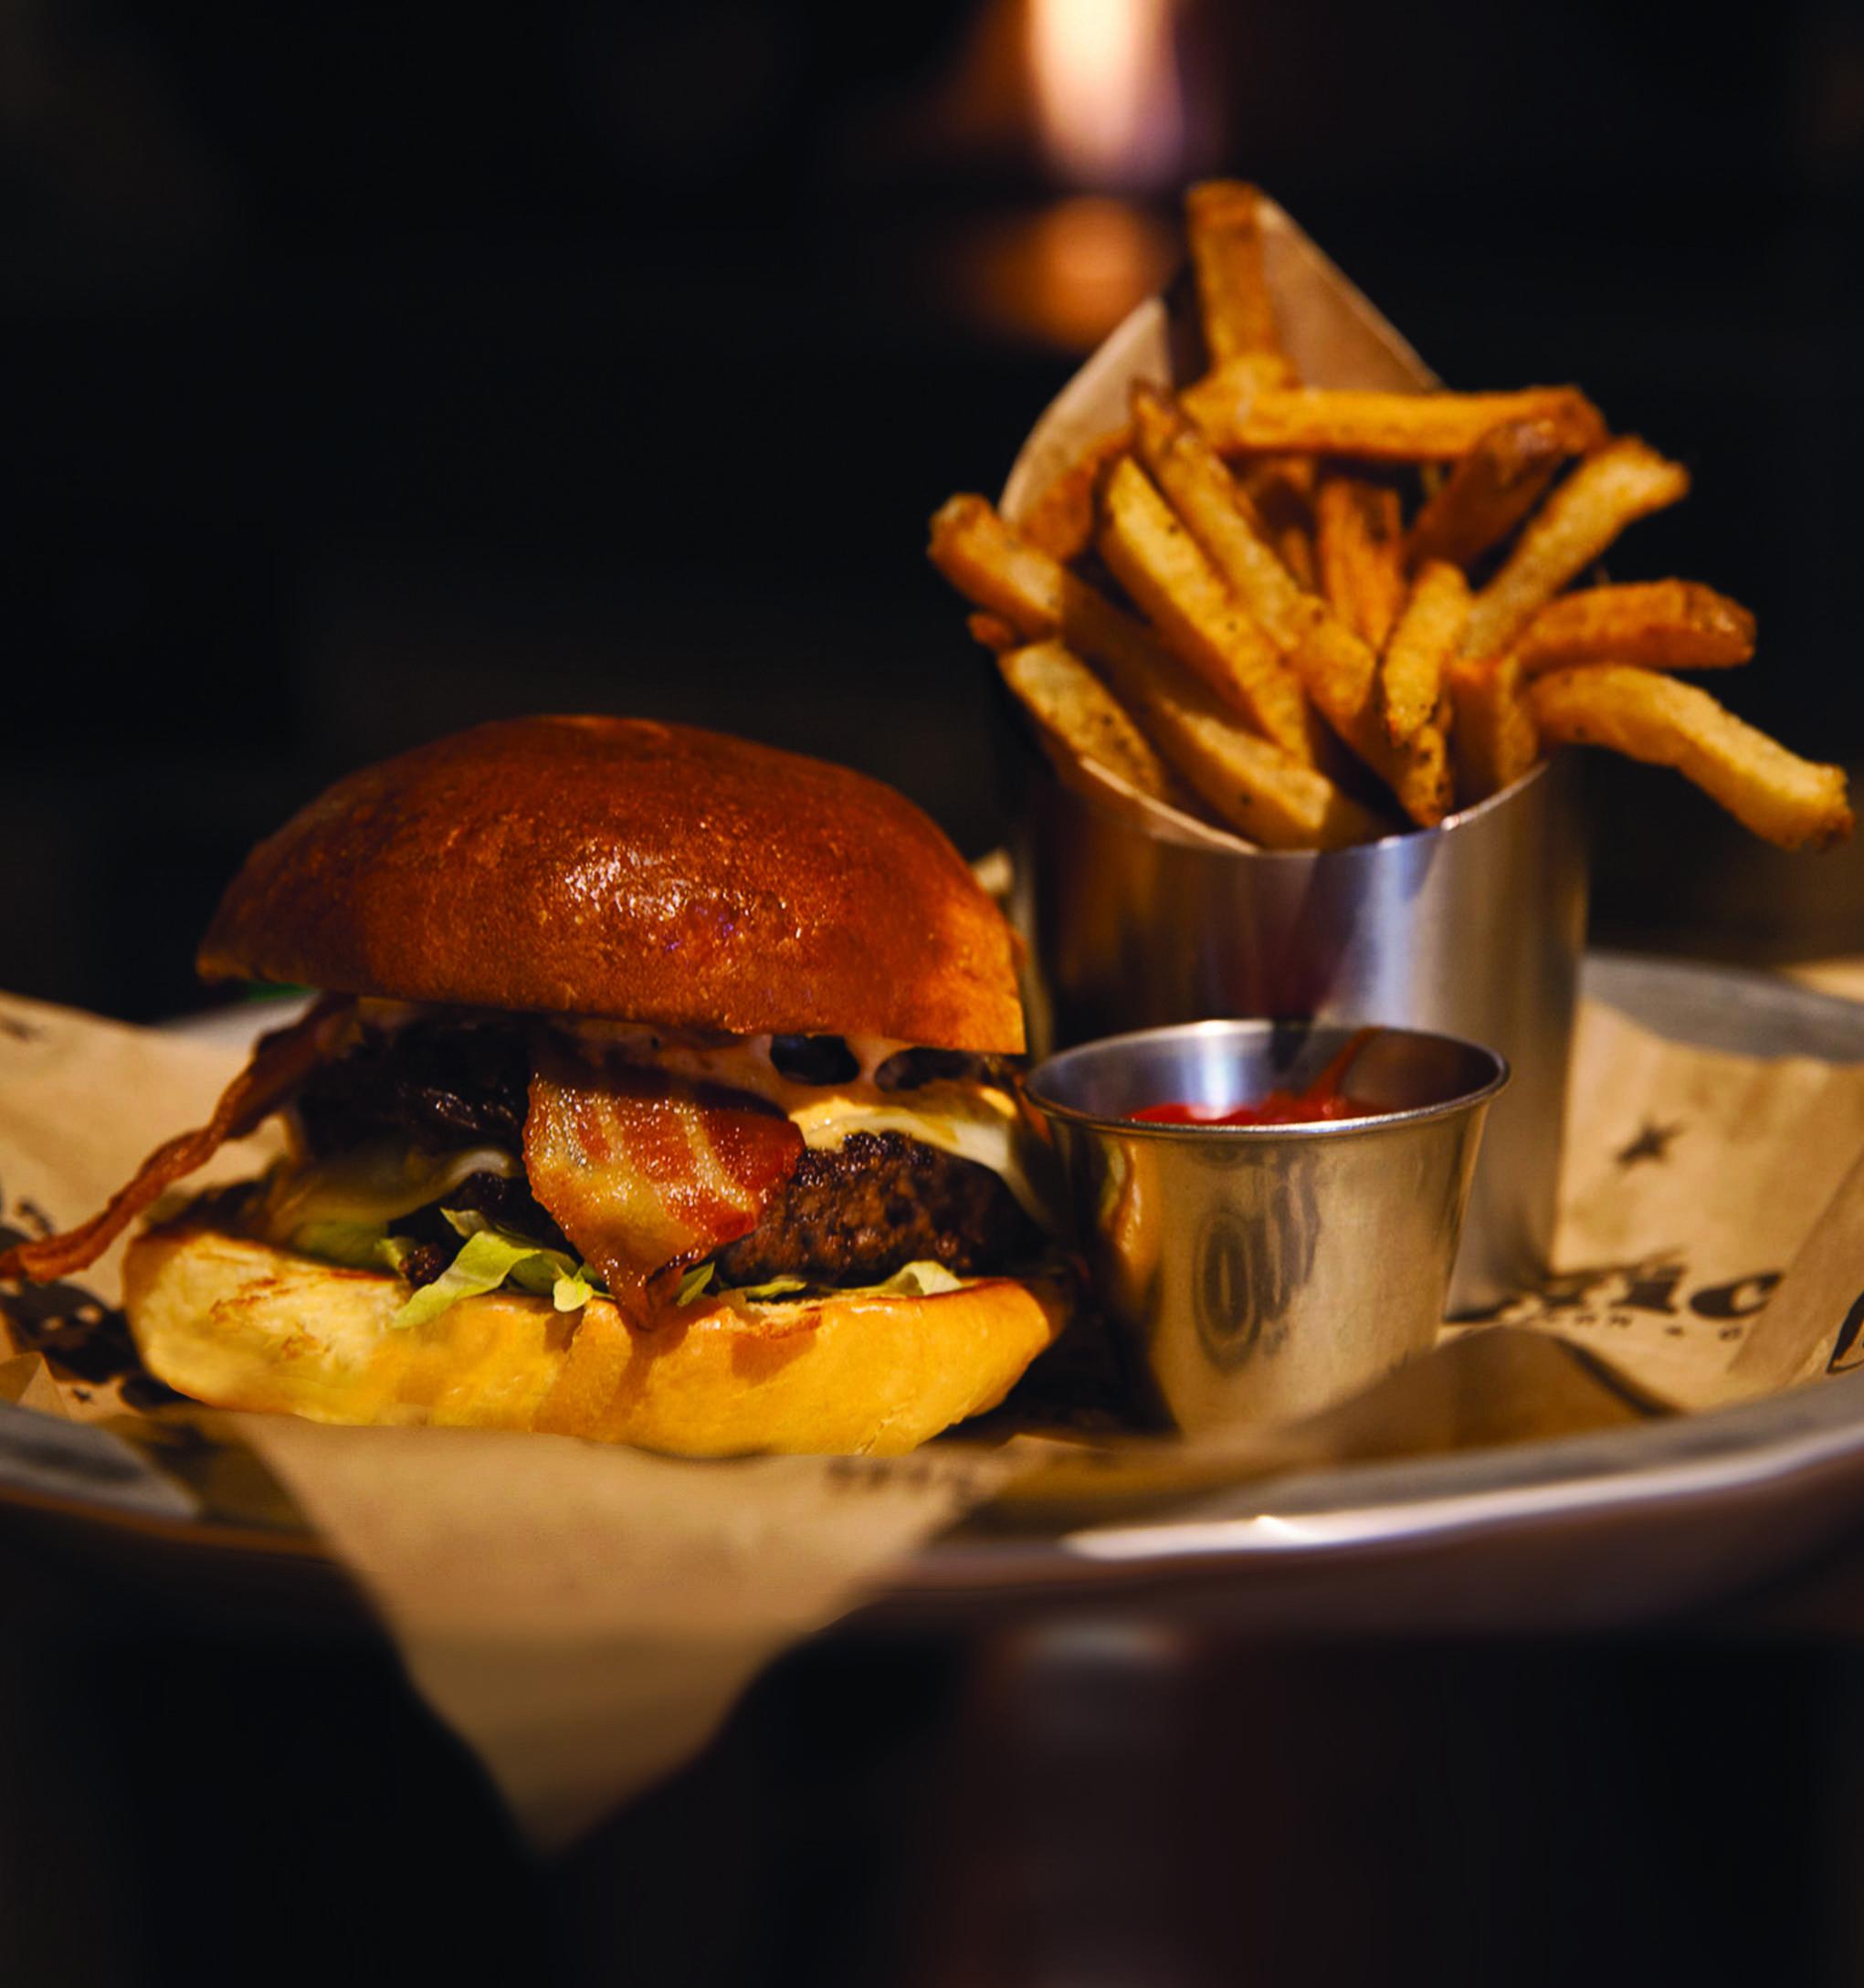 918335466fb7c0b0e8eb_OTG-Burger.jpg